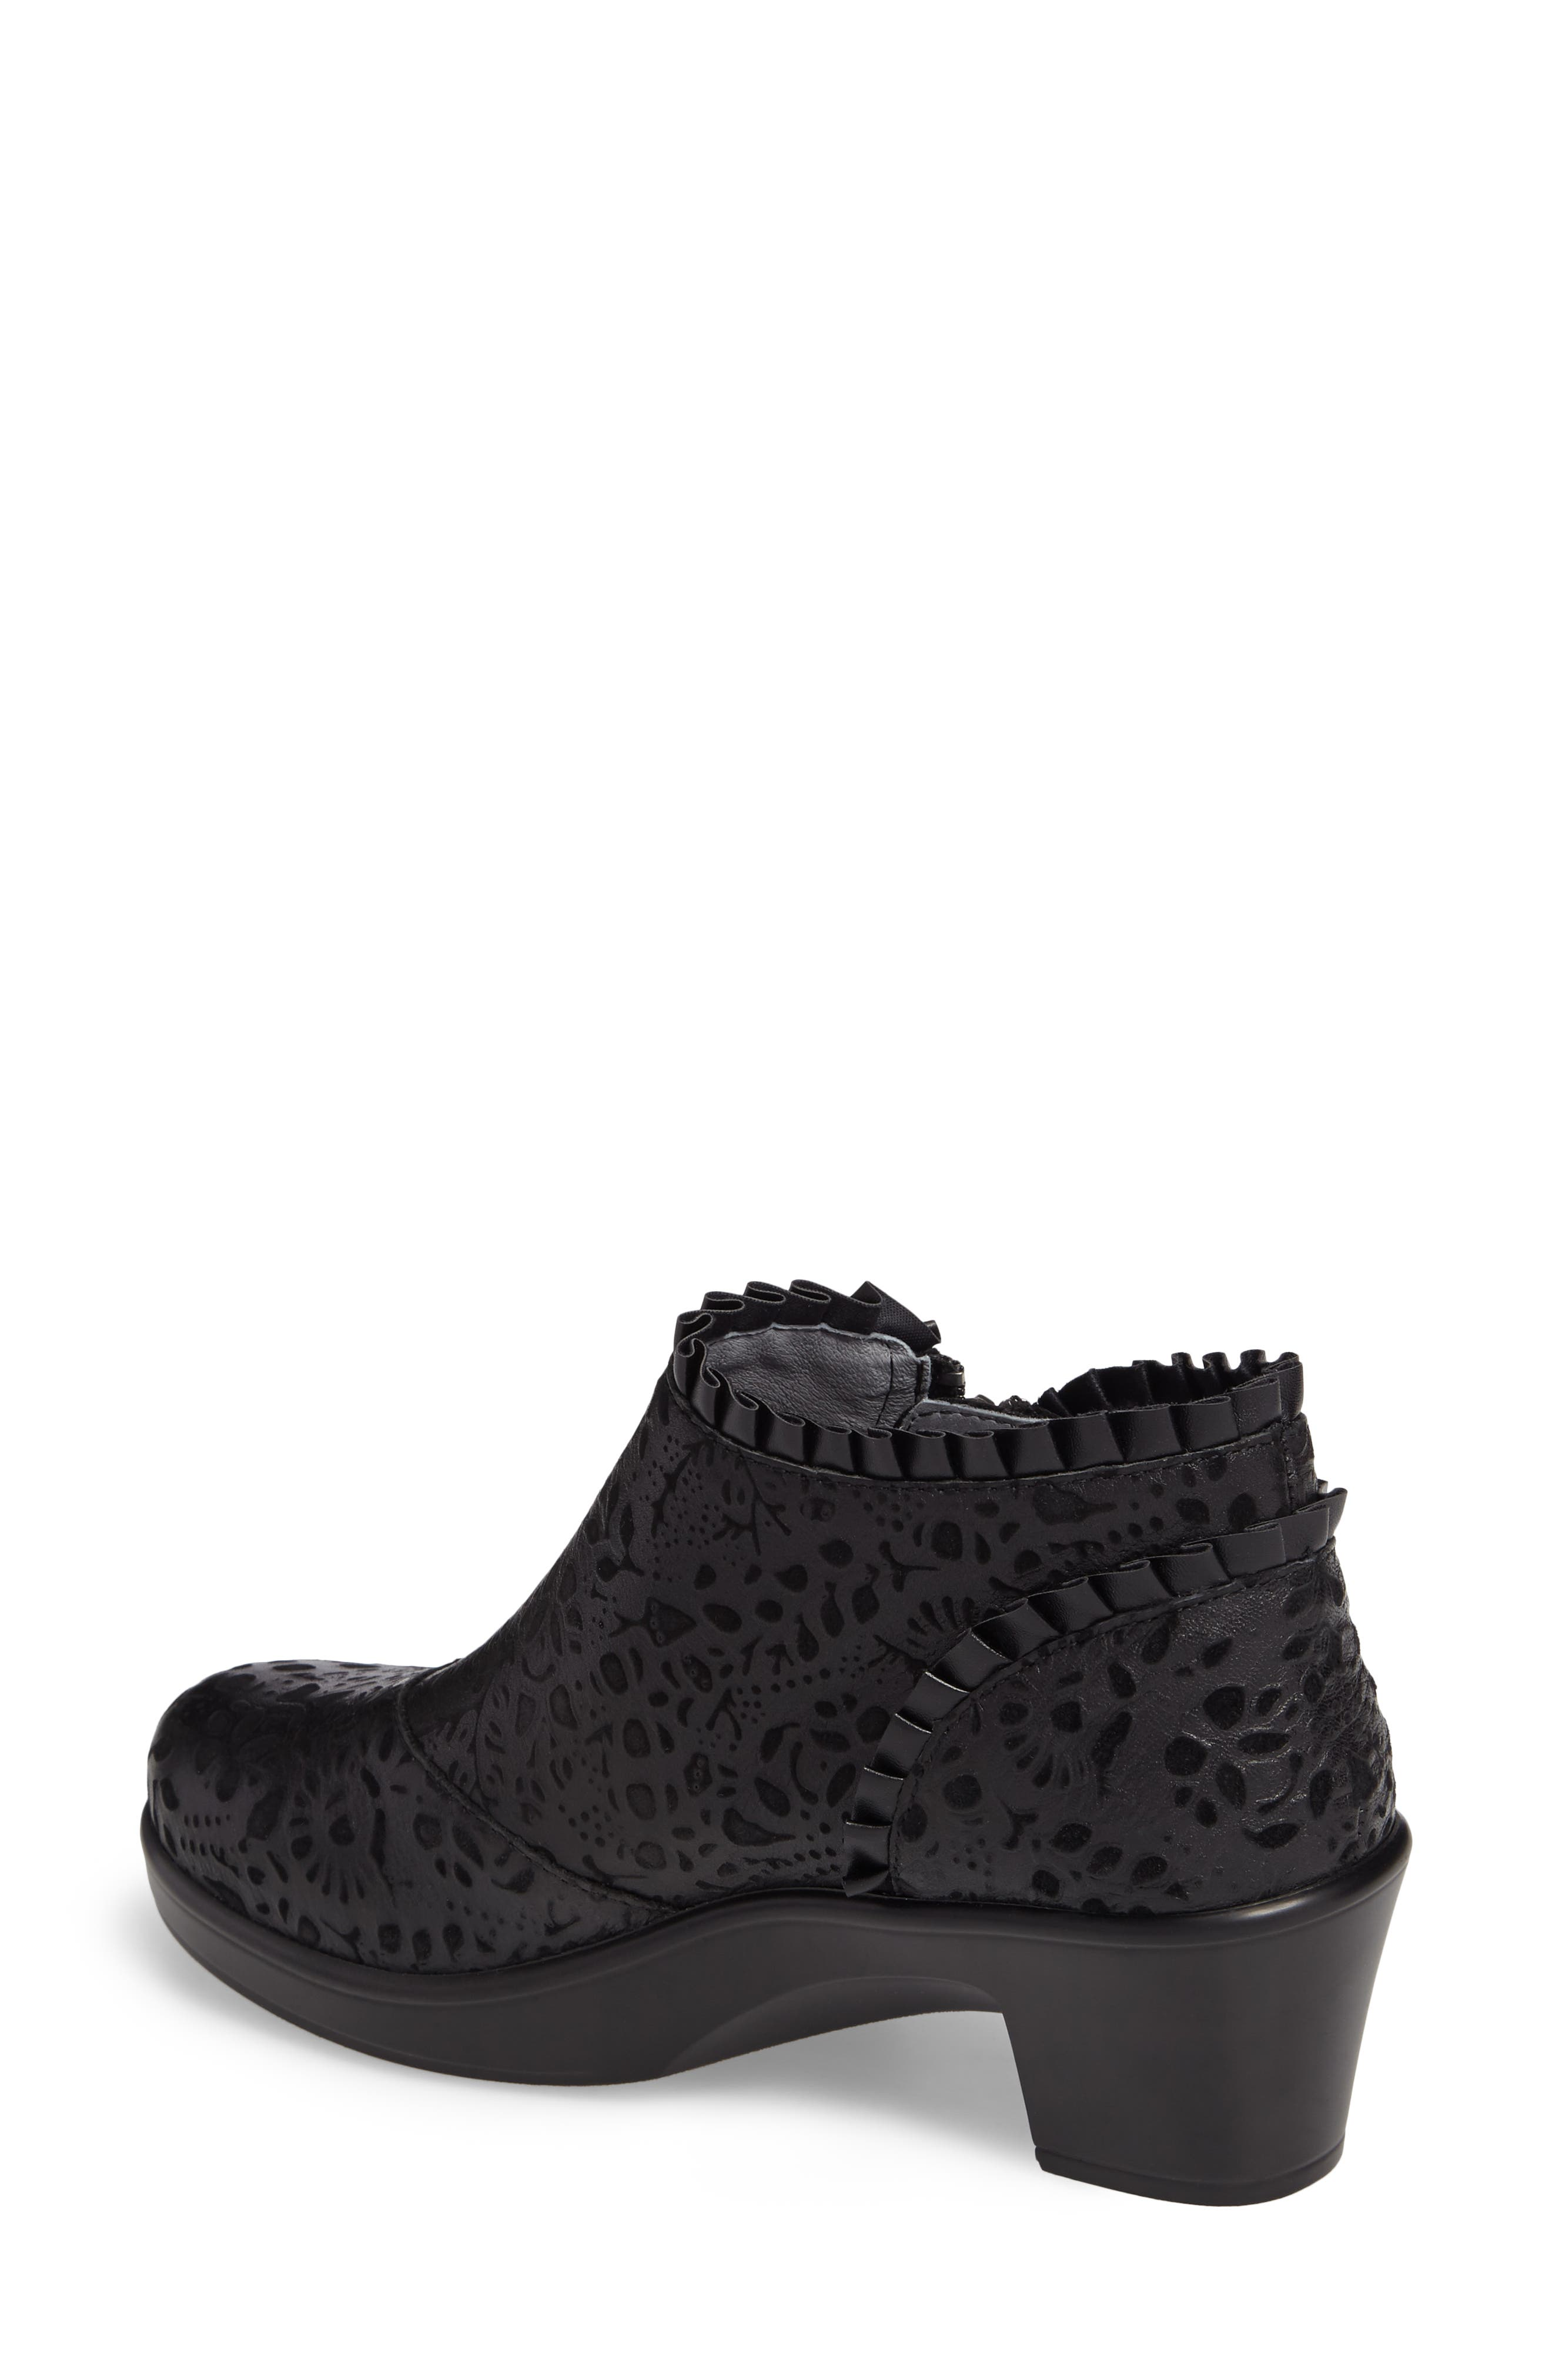 'Hannah' Saddle Boot,                             Alternate thumbnail 2, color,                             Delicut Leather